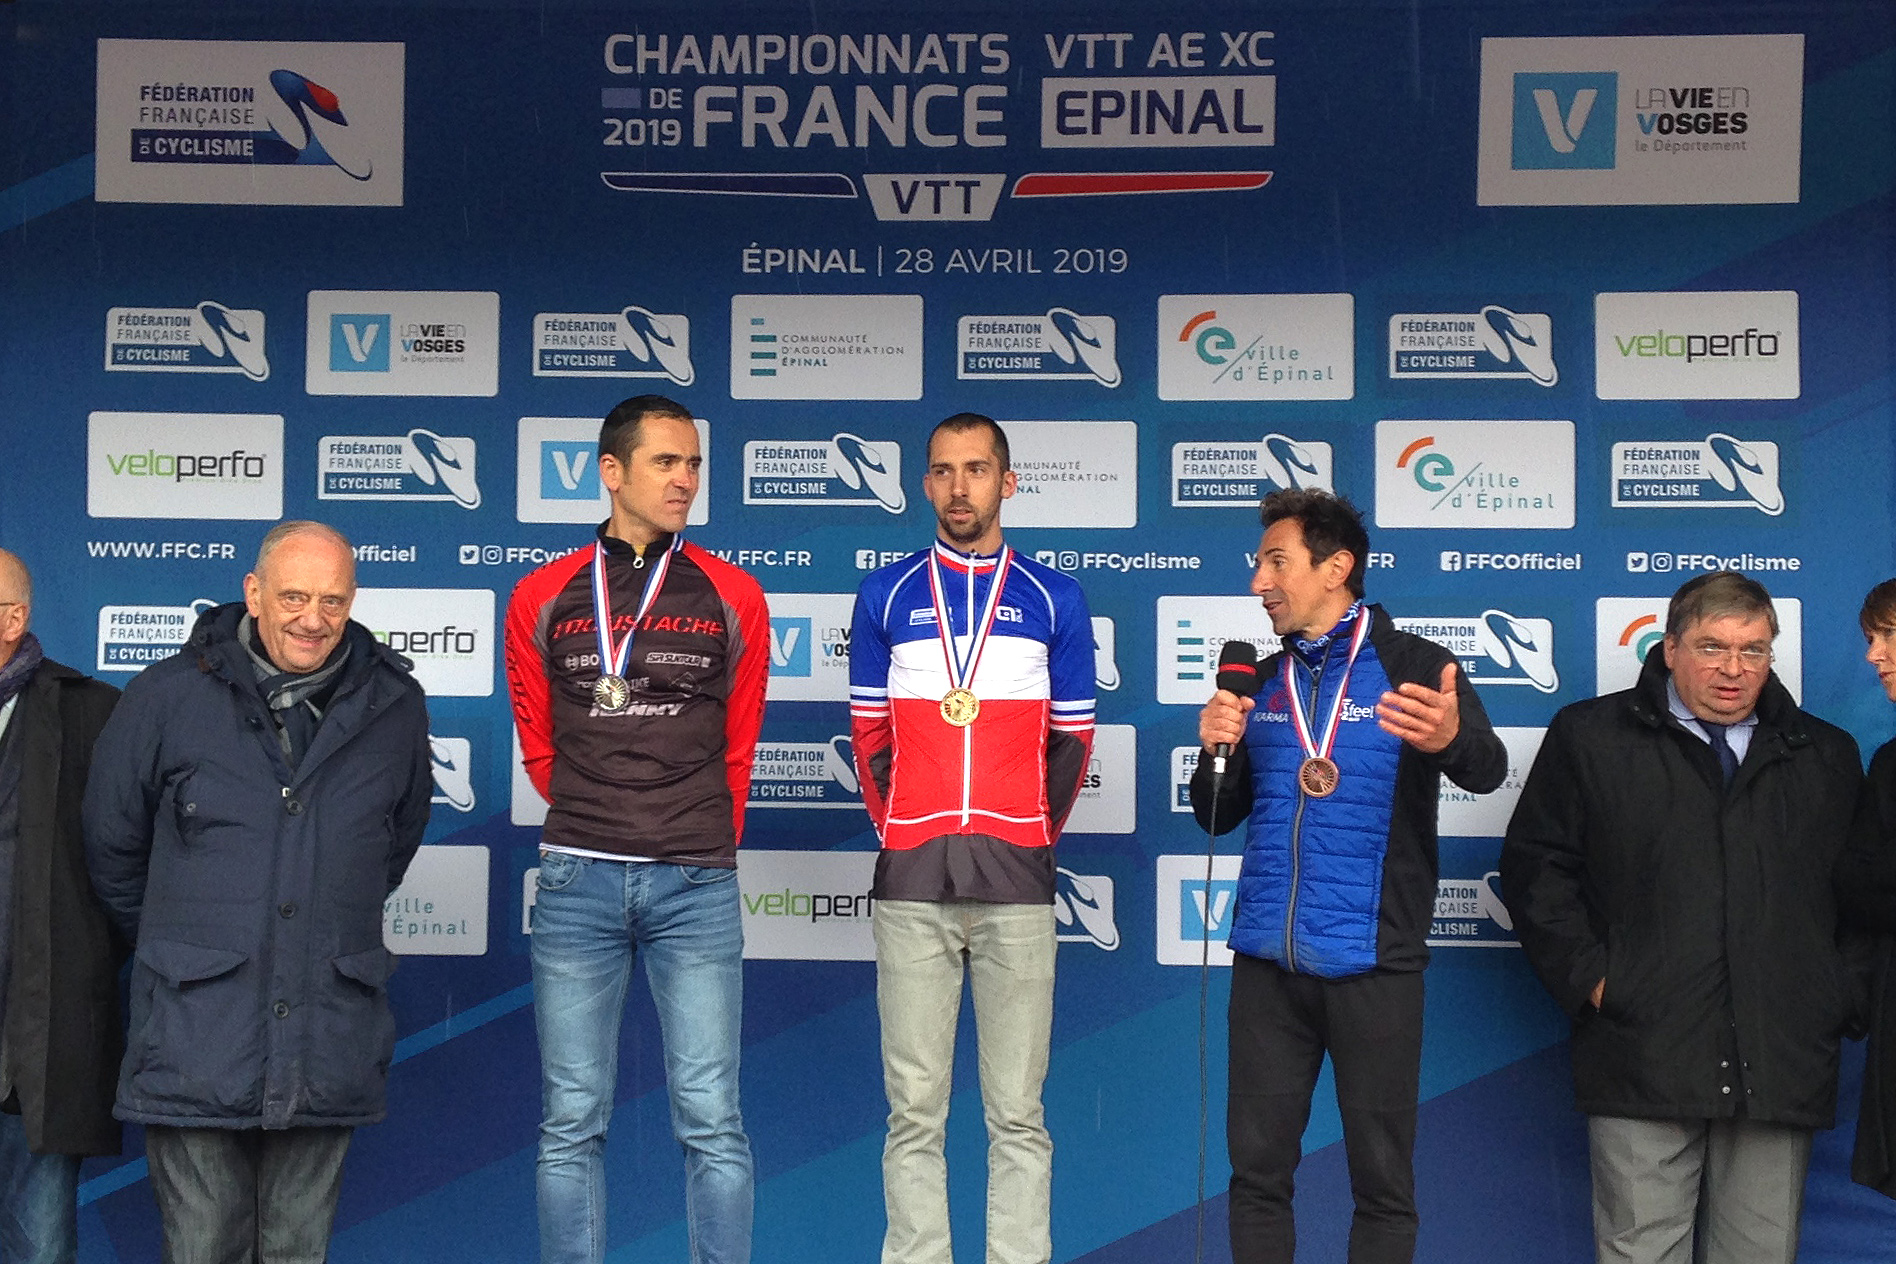 championnats france vttae xc 2019 jerome gilloux 1